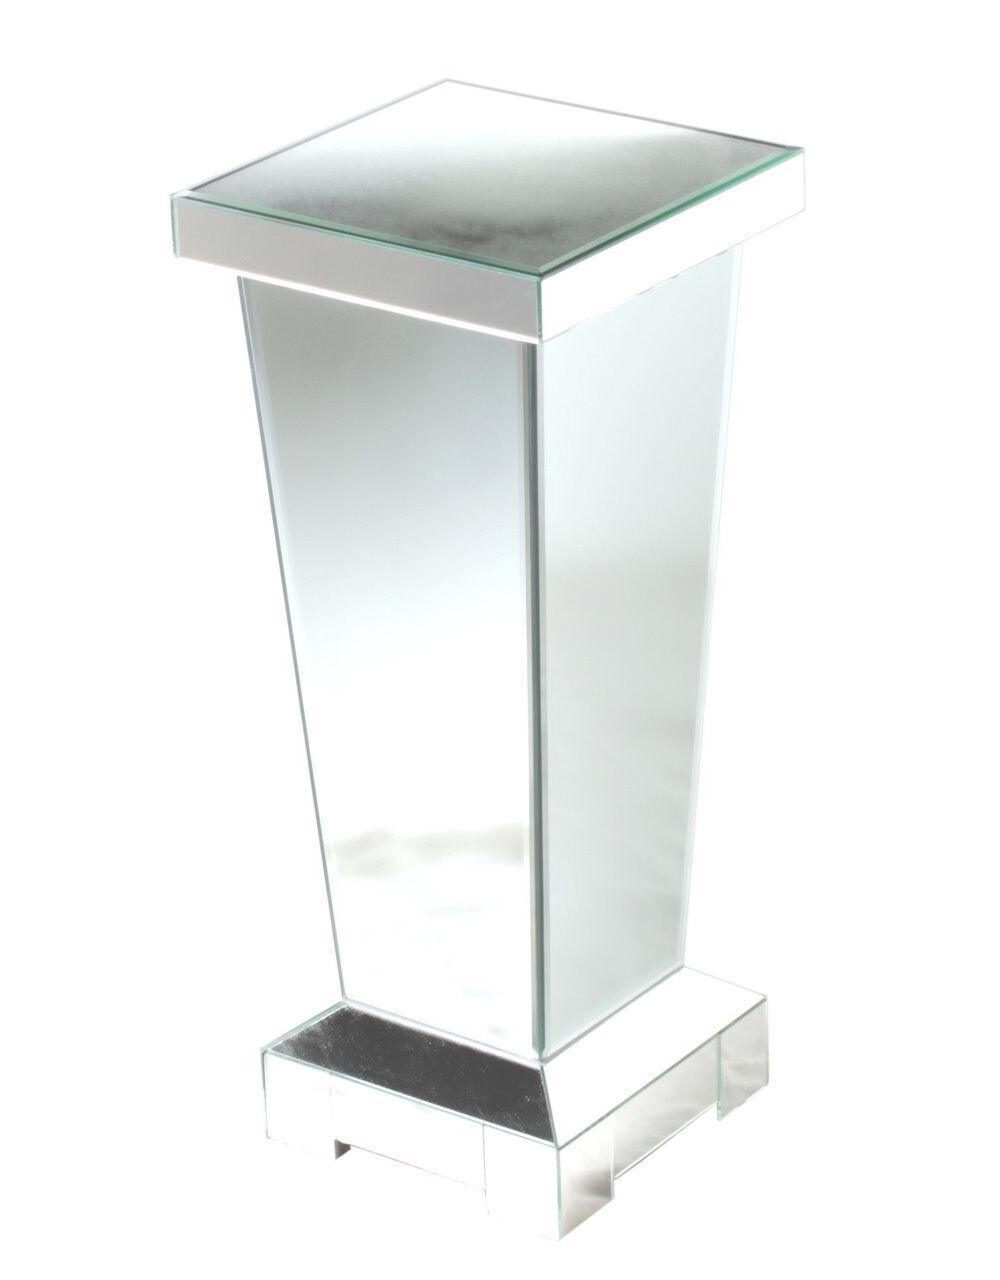 Mirrored Furniture Living Room Mirrored Furniture